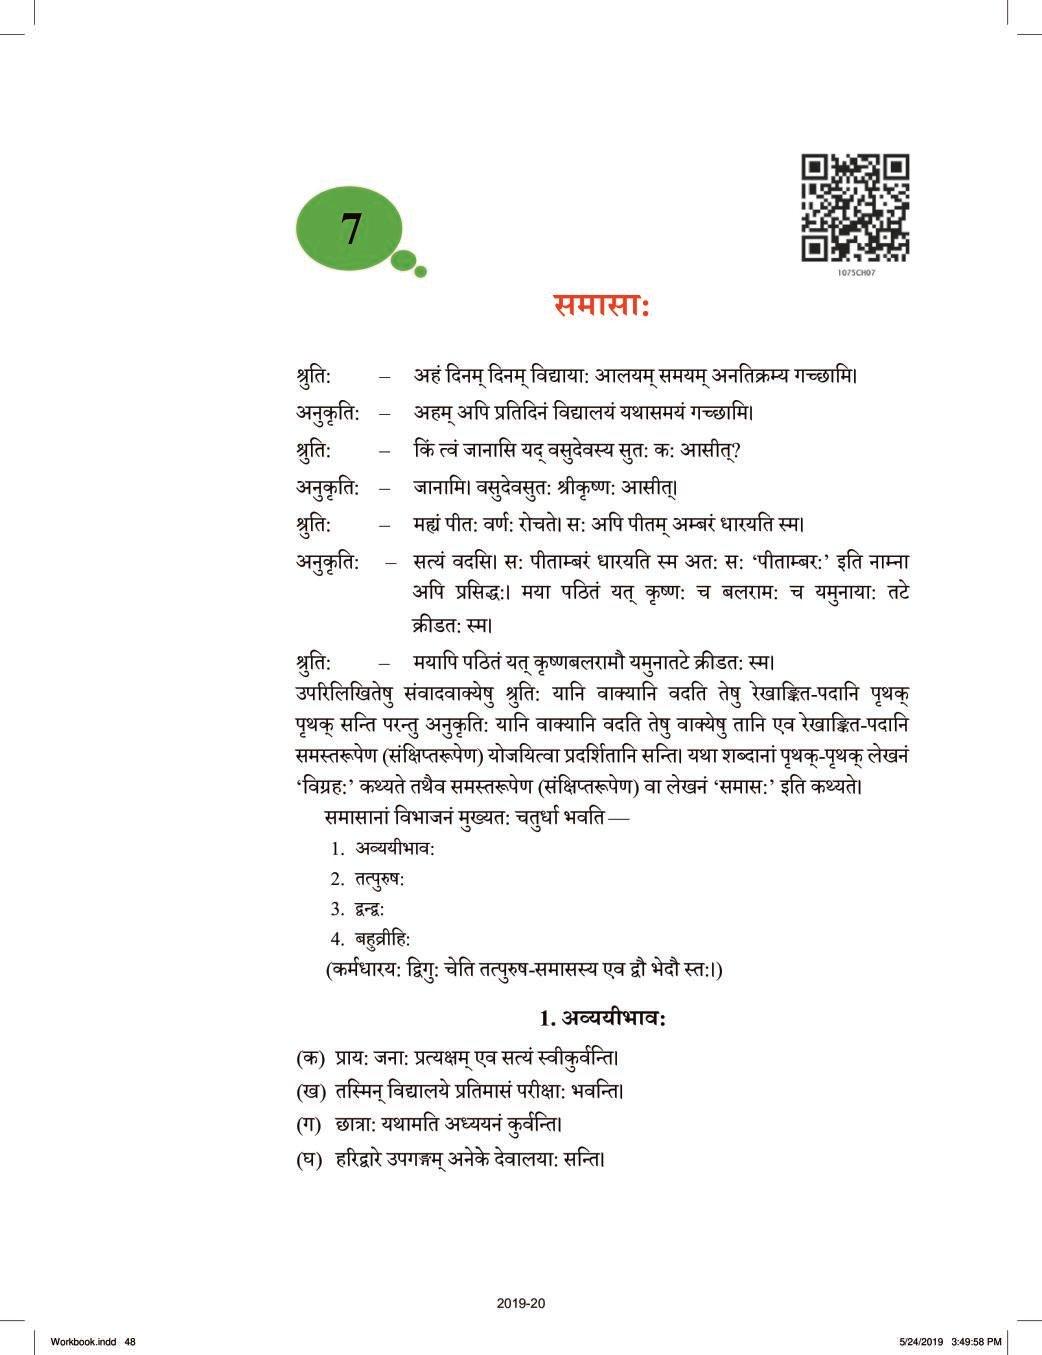 NCERT Book Class 10 Sanskrit (अभ्यासवान् भव) Chapter 7 समासाः - Page 1